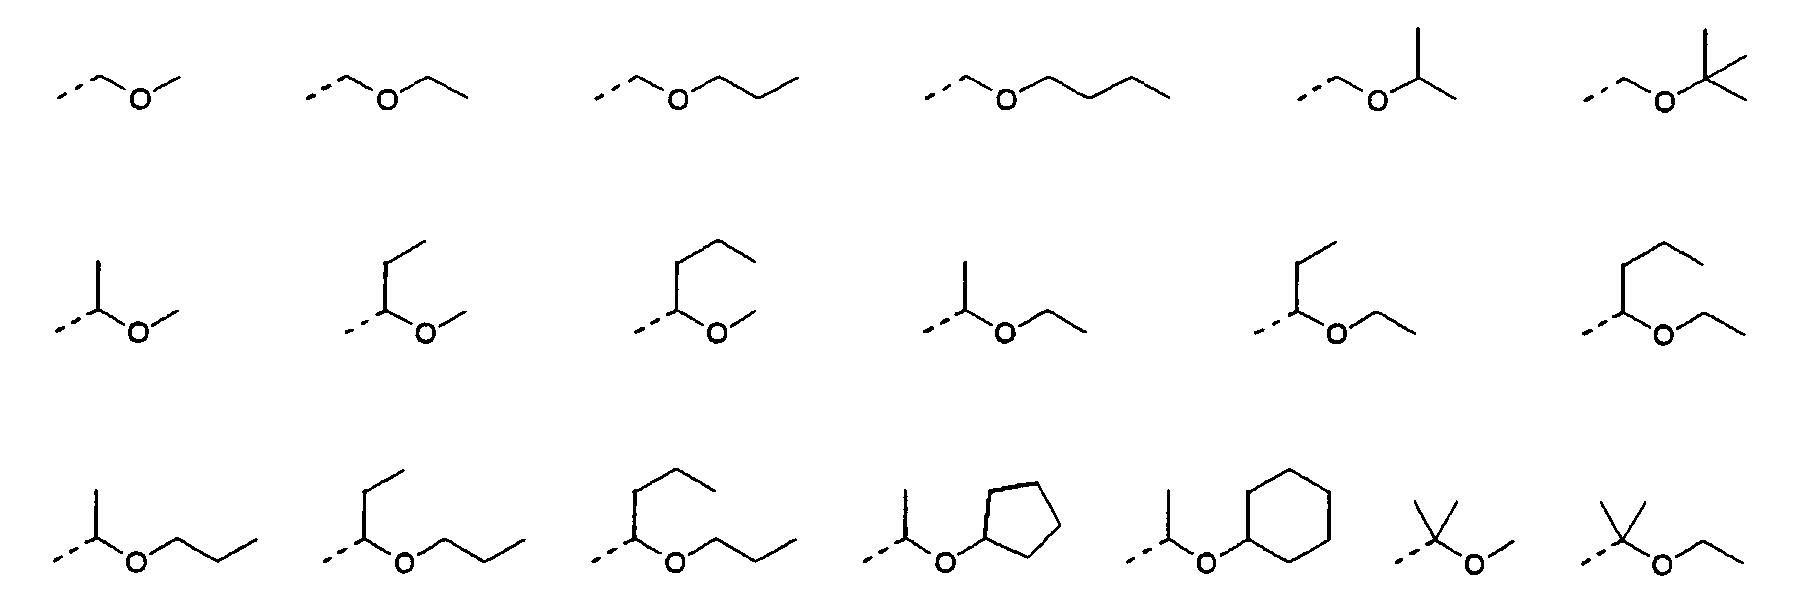 Figure 112002022201306-pat00016